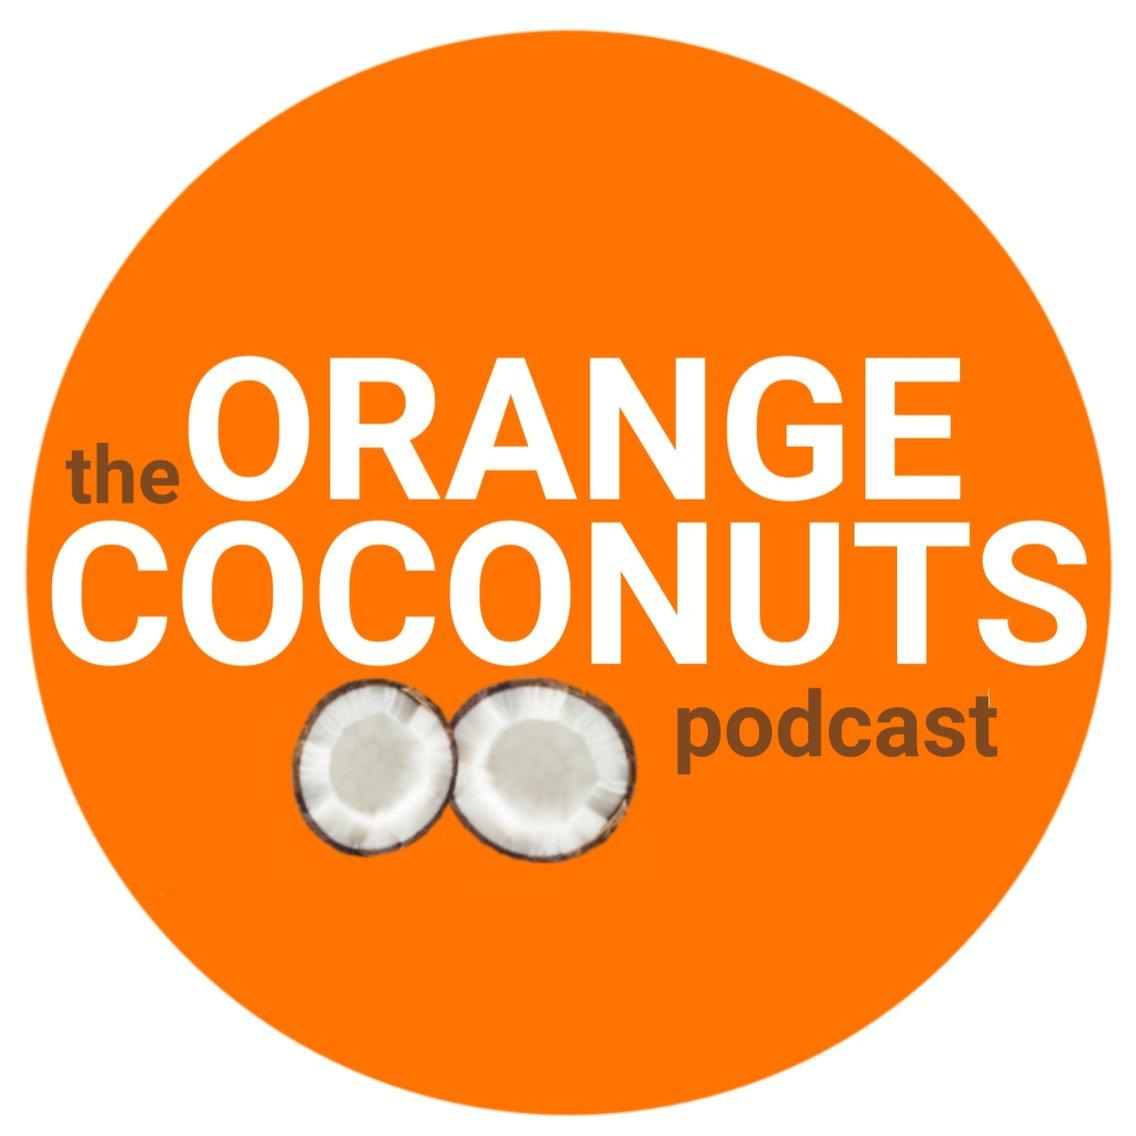 Orange Coconuts Podcast - imagen de portada